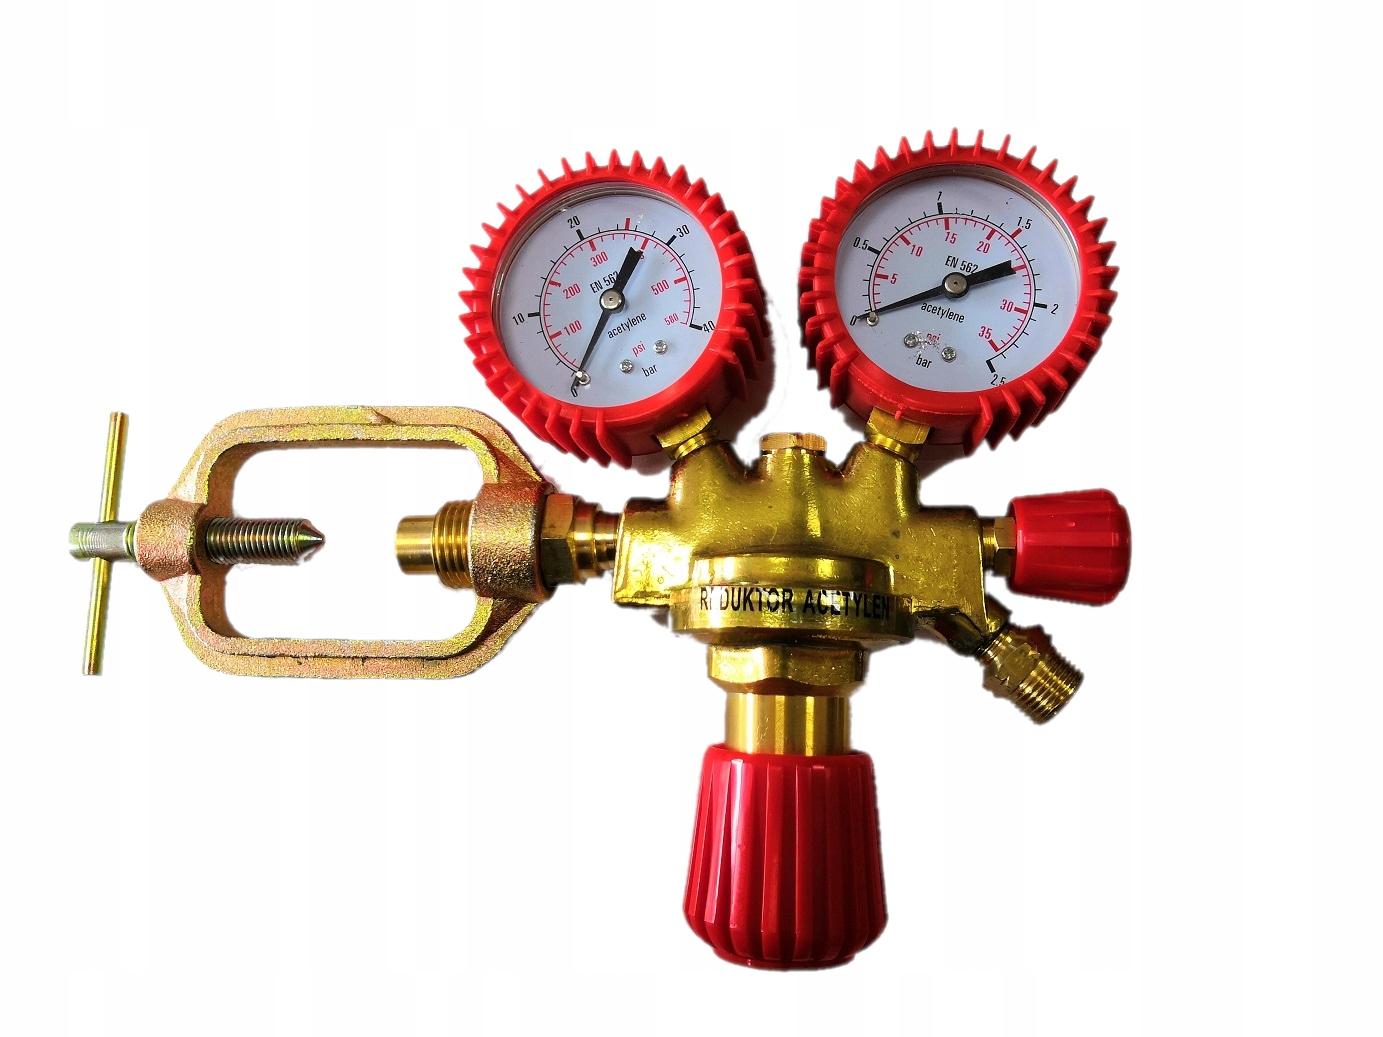 Plynný plynový valček acetylén acetylén